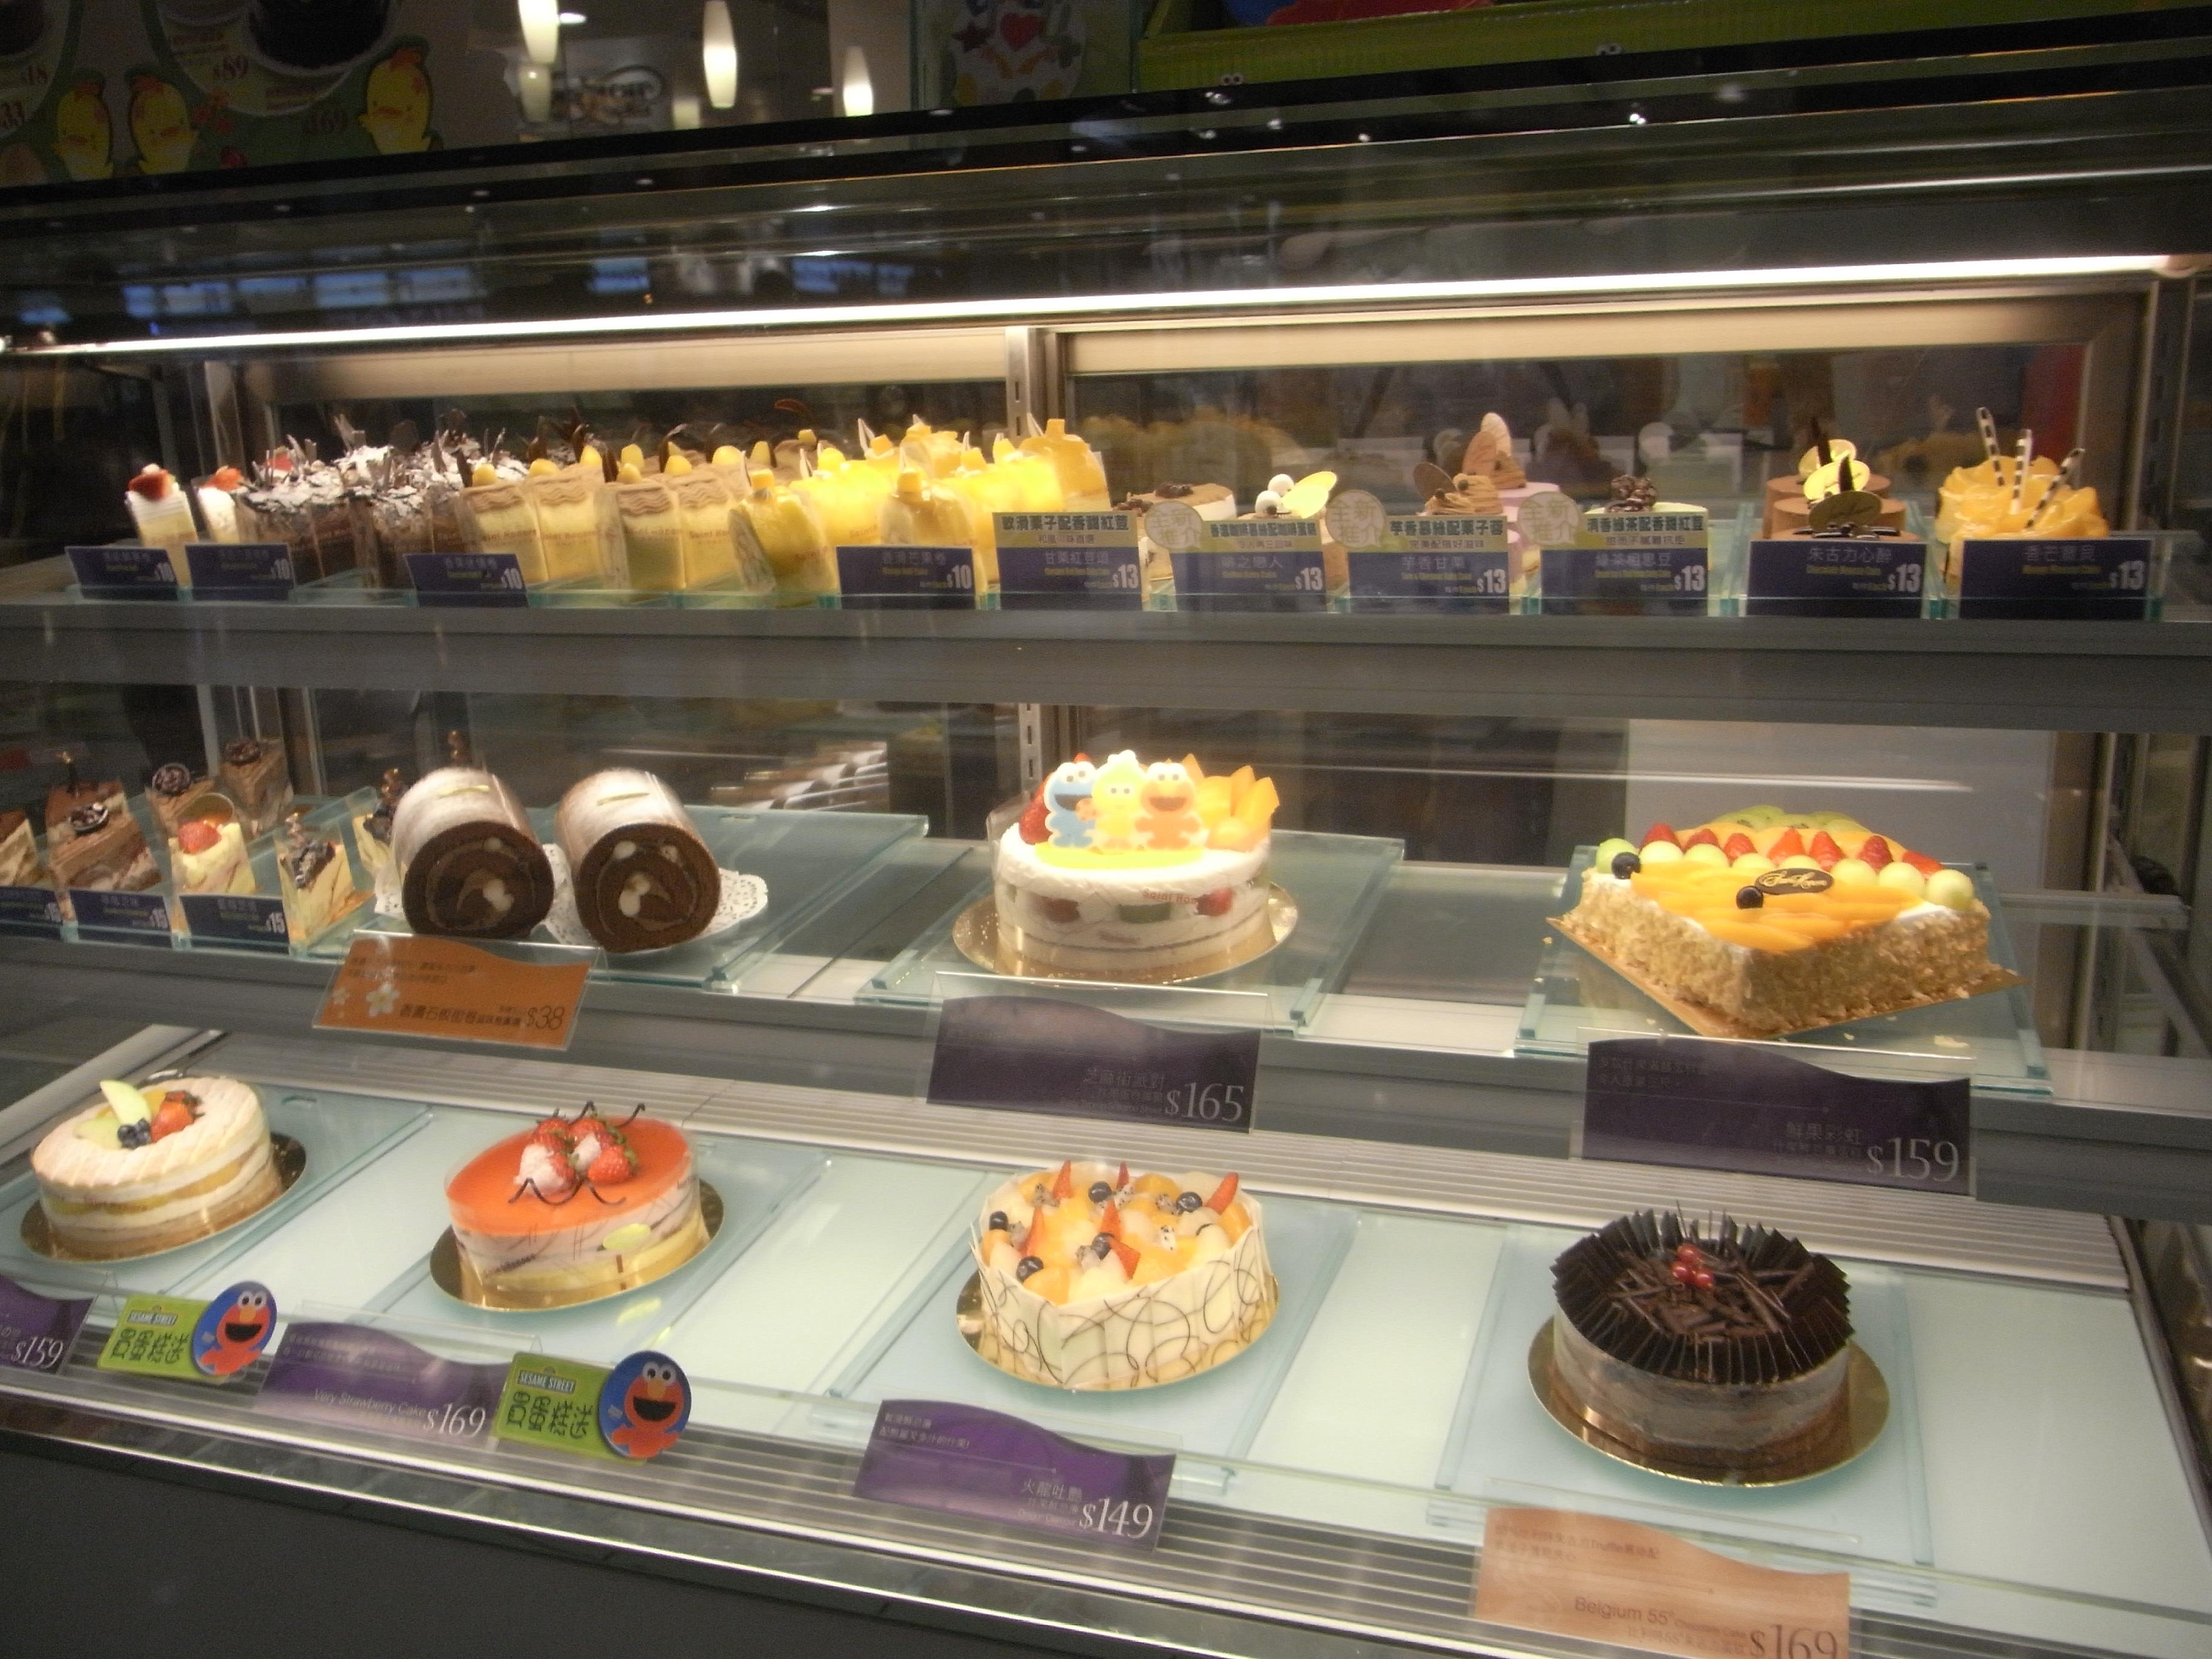 Cakes And Snacks Shop Dhanbadranchibokarodeoghar Jamshedpur